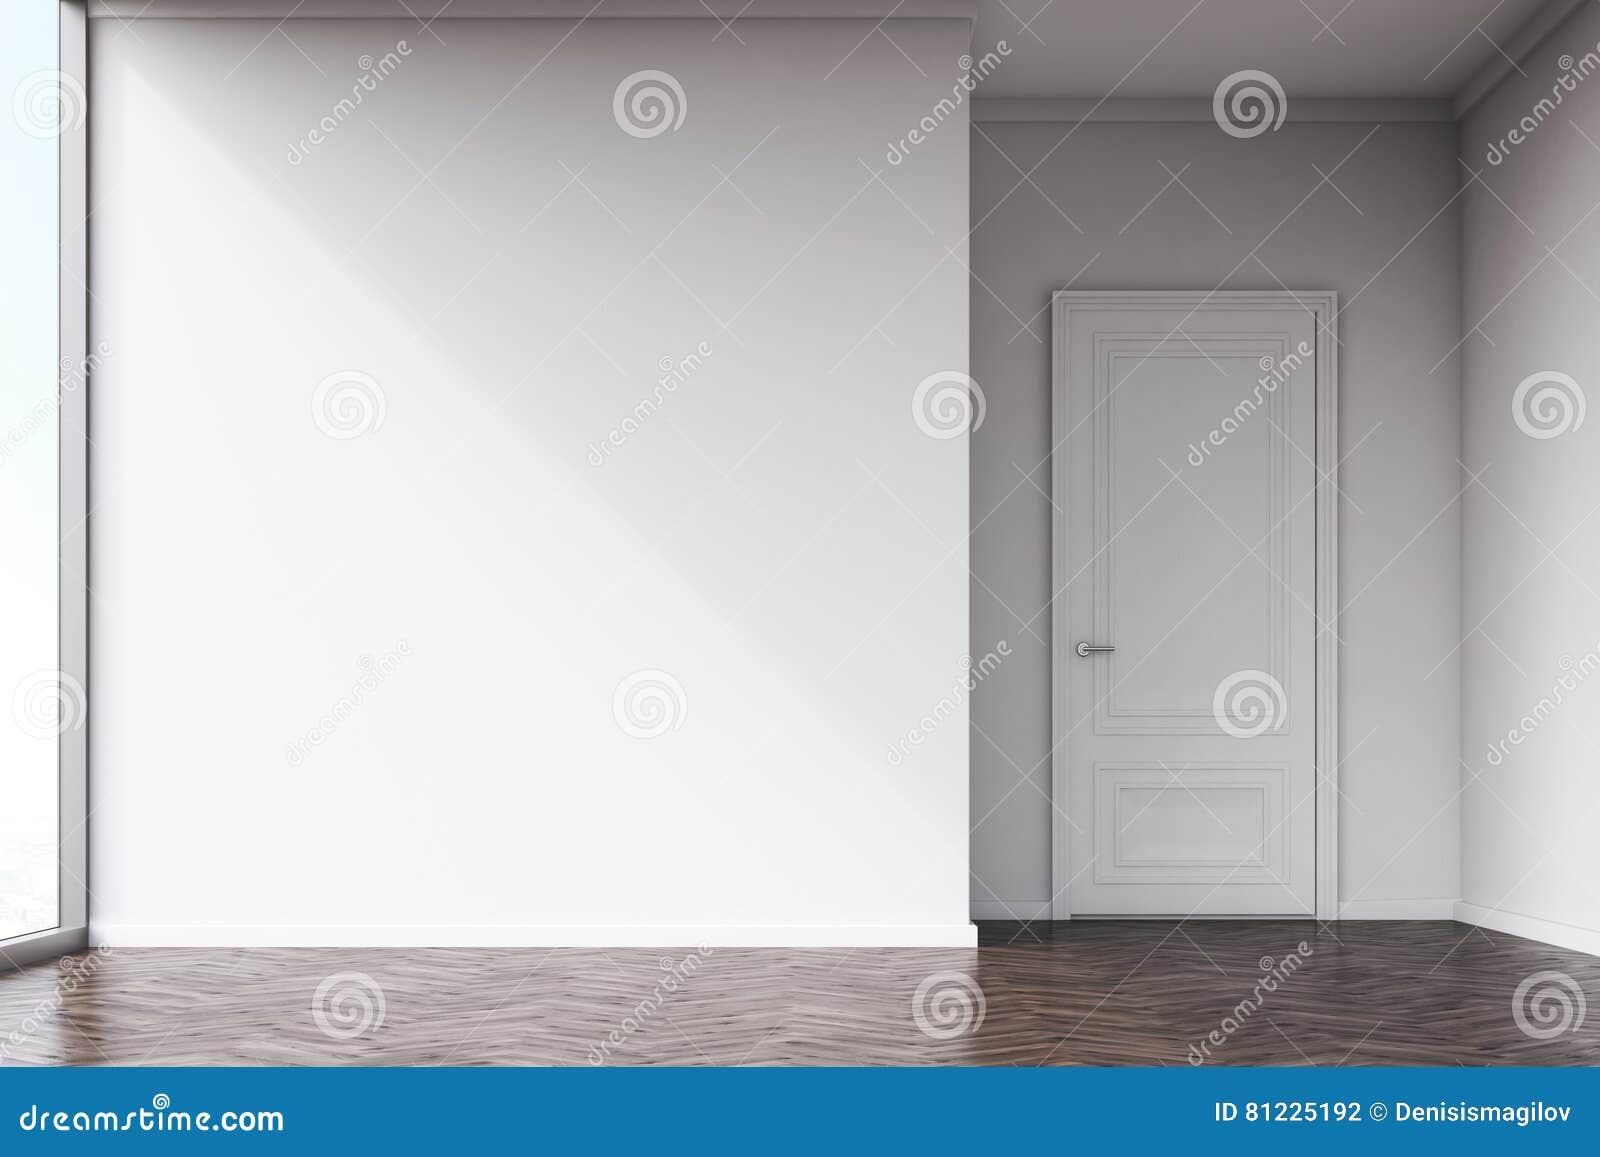 Dark empty room with window - Empty Room With White Walls And Dark Wood Floor Stock Photo